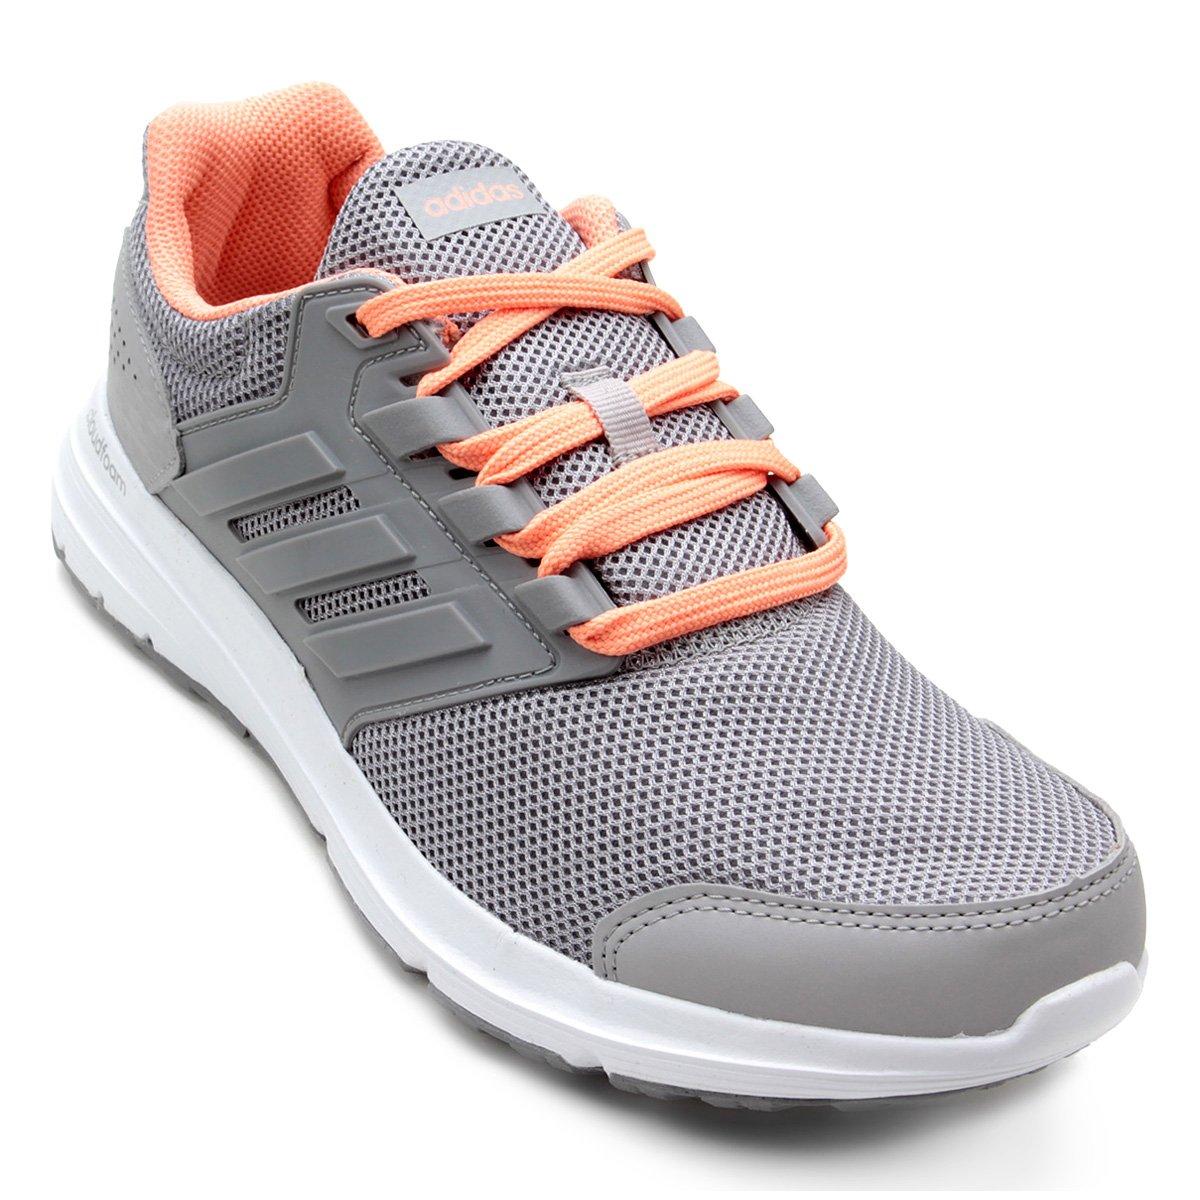 Tênis Adidas Galaxy 4 Feminino Cinza